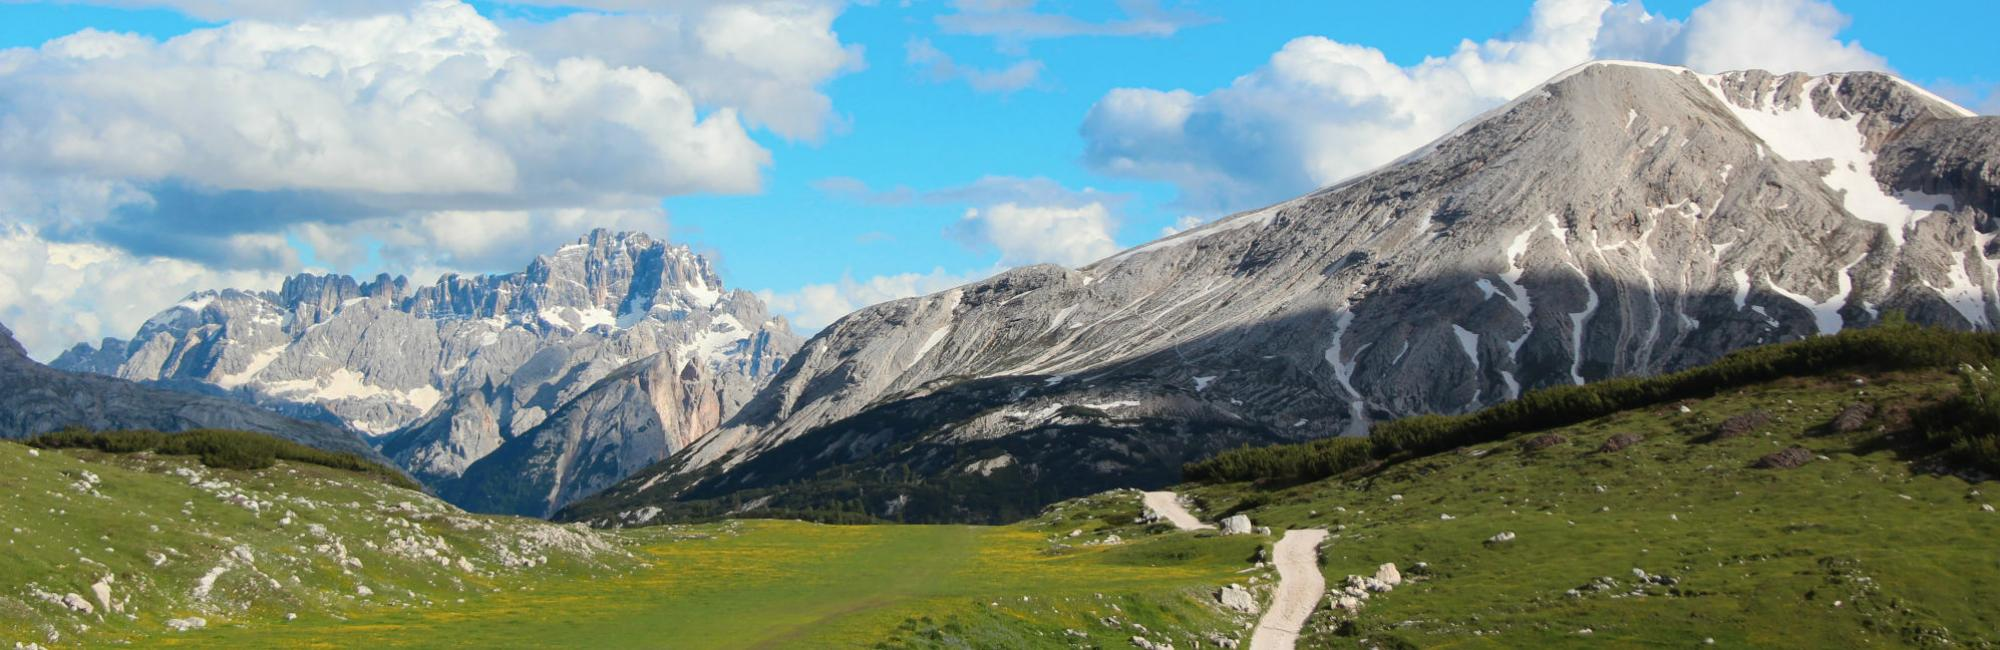 Dolomites of Val di Fassa & Val Gardena 8-day walking holiday